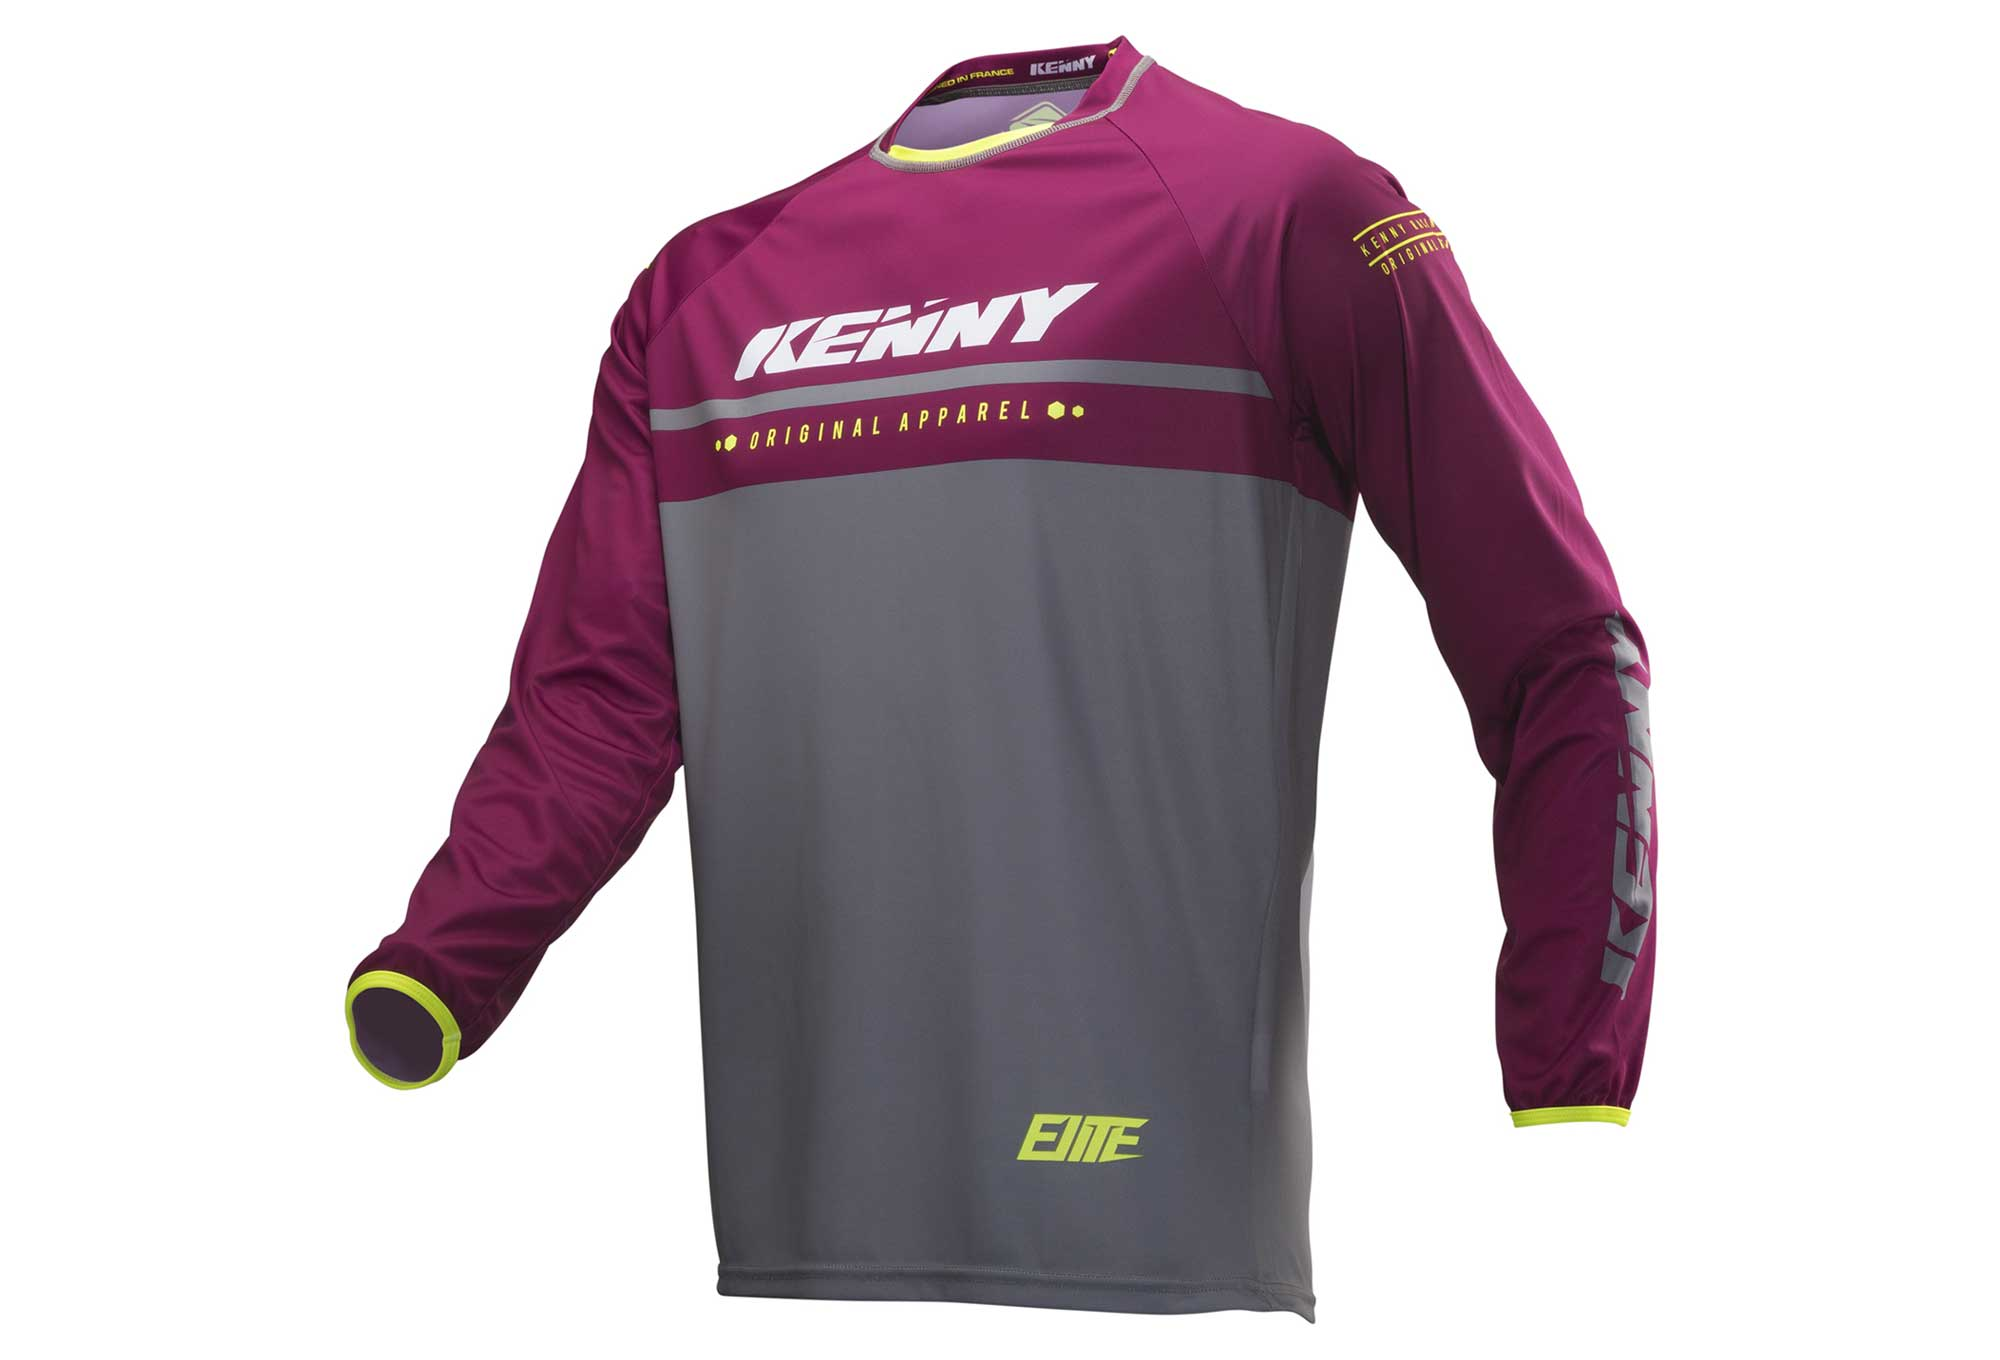 3a4f3eeb8a7 Kenny Elite Long Sleeves Jersey Burgundy | Alltricks.com